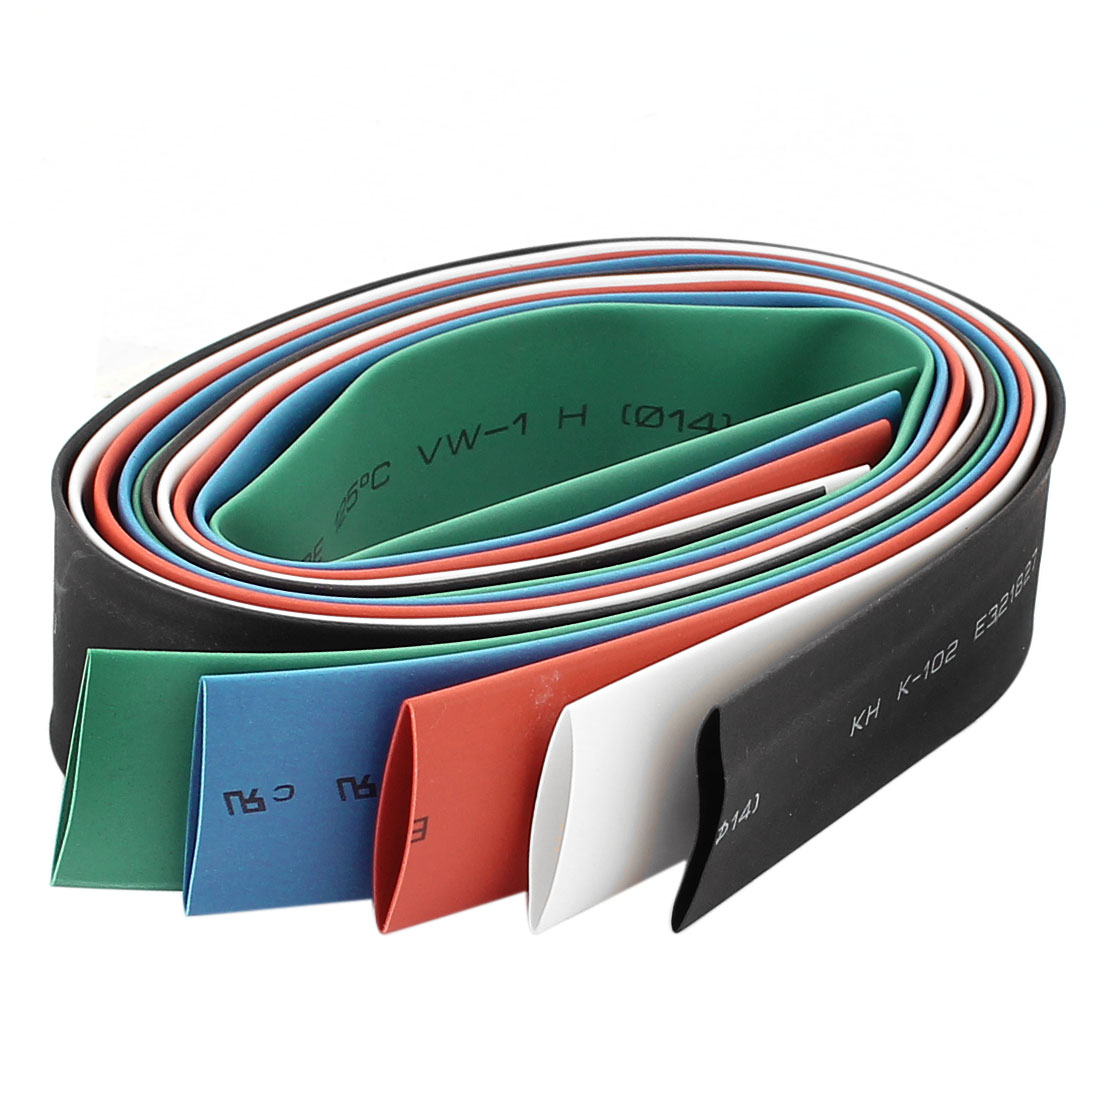 14mm Dia Polyolefin Heat Shrinkable Tube Shrink Tubing 1.6Ft 5pcs